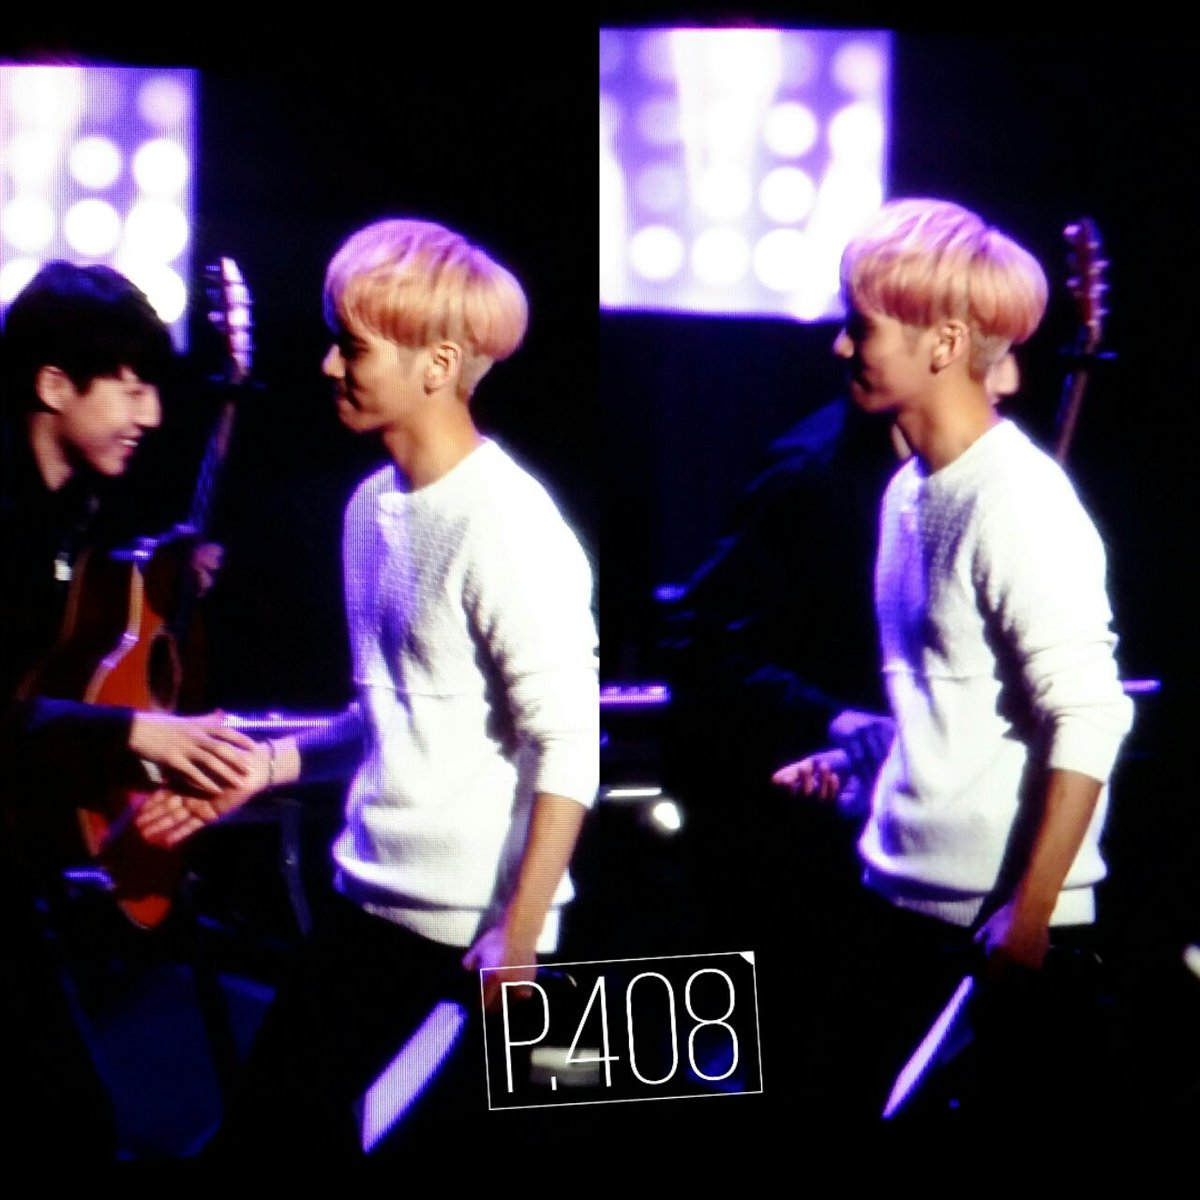 160426 Jonghyun @ MBC Live Concert - Blue Night Cg93YBGWYAAv0zT